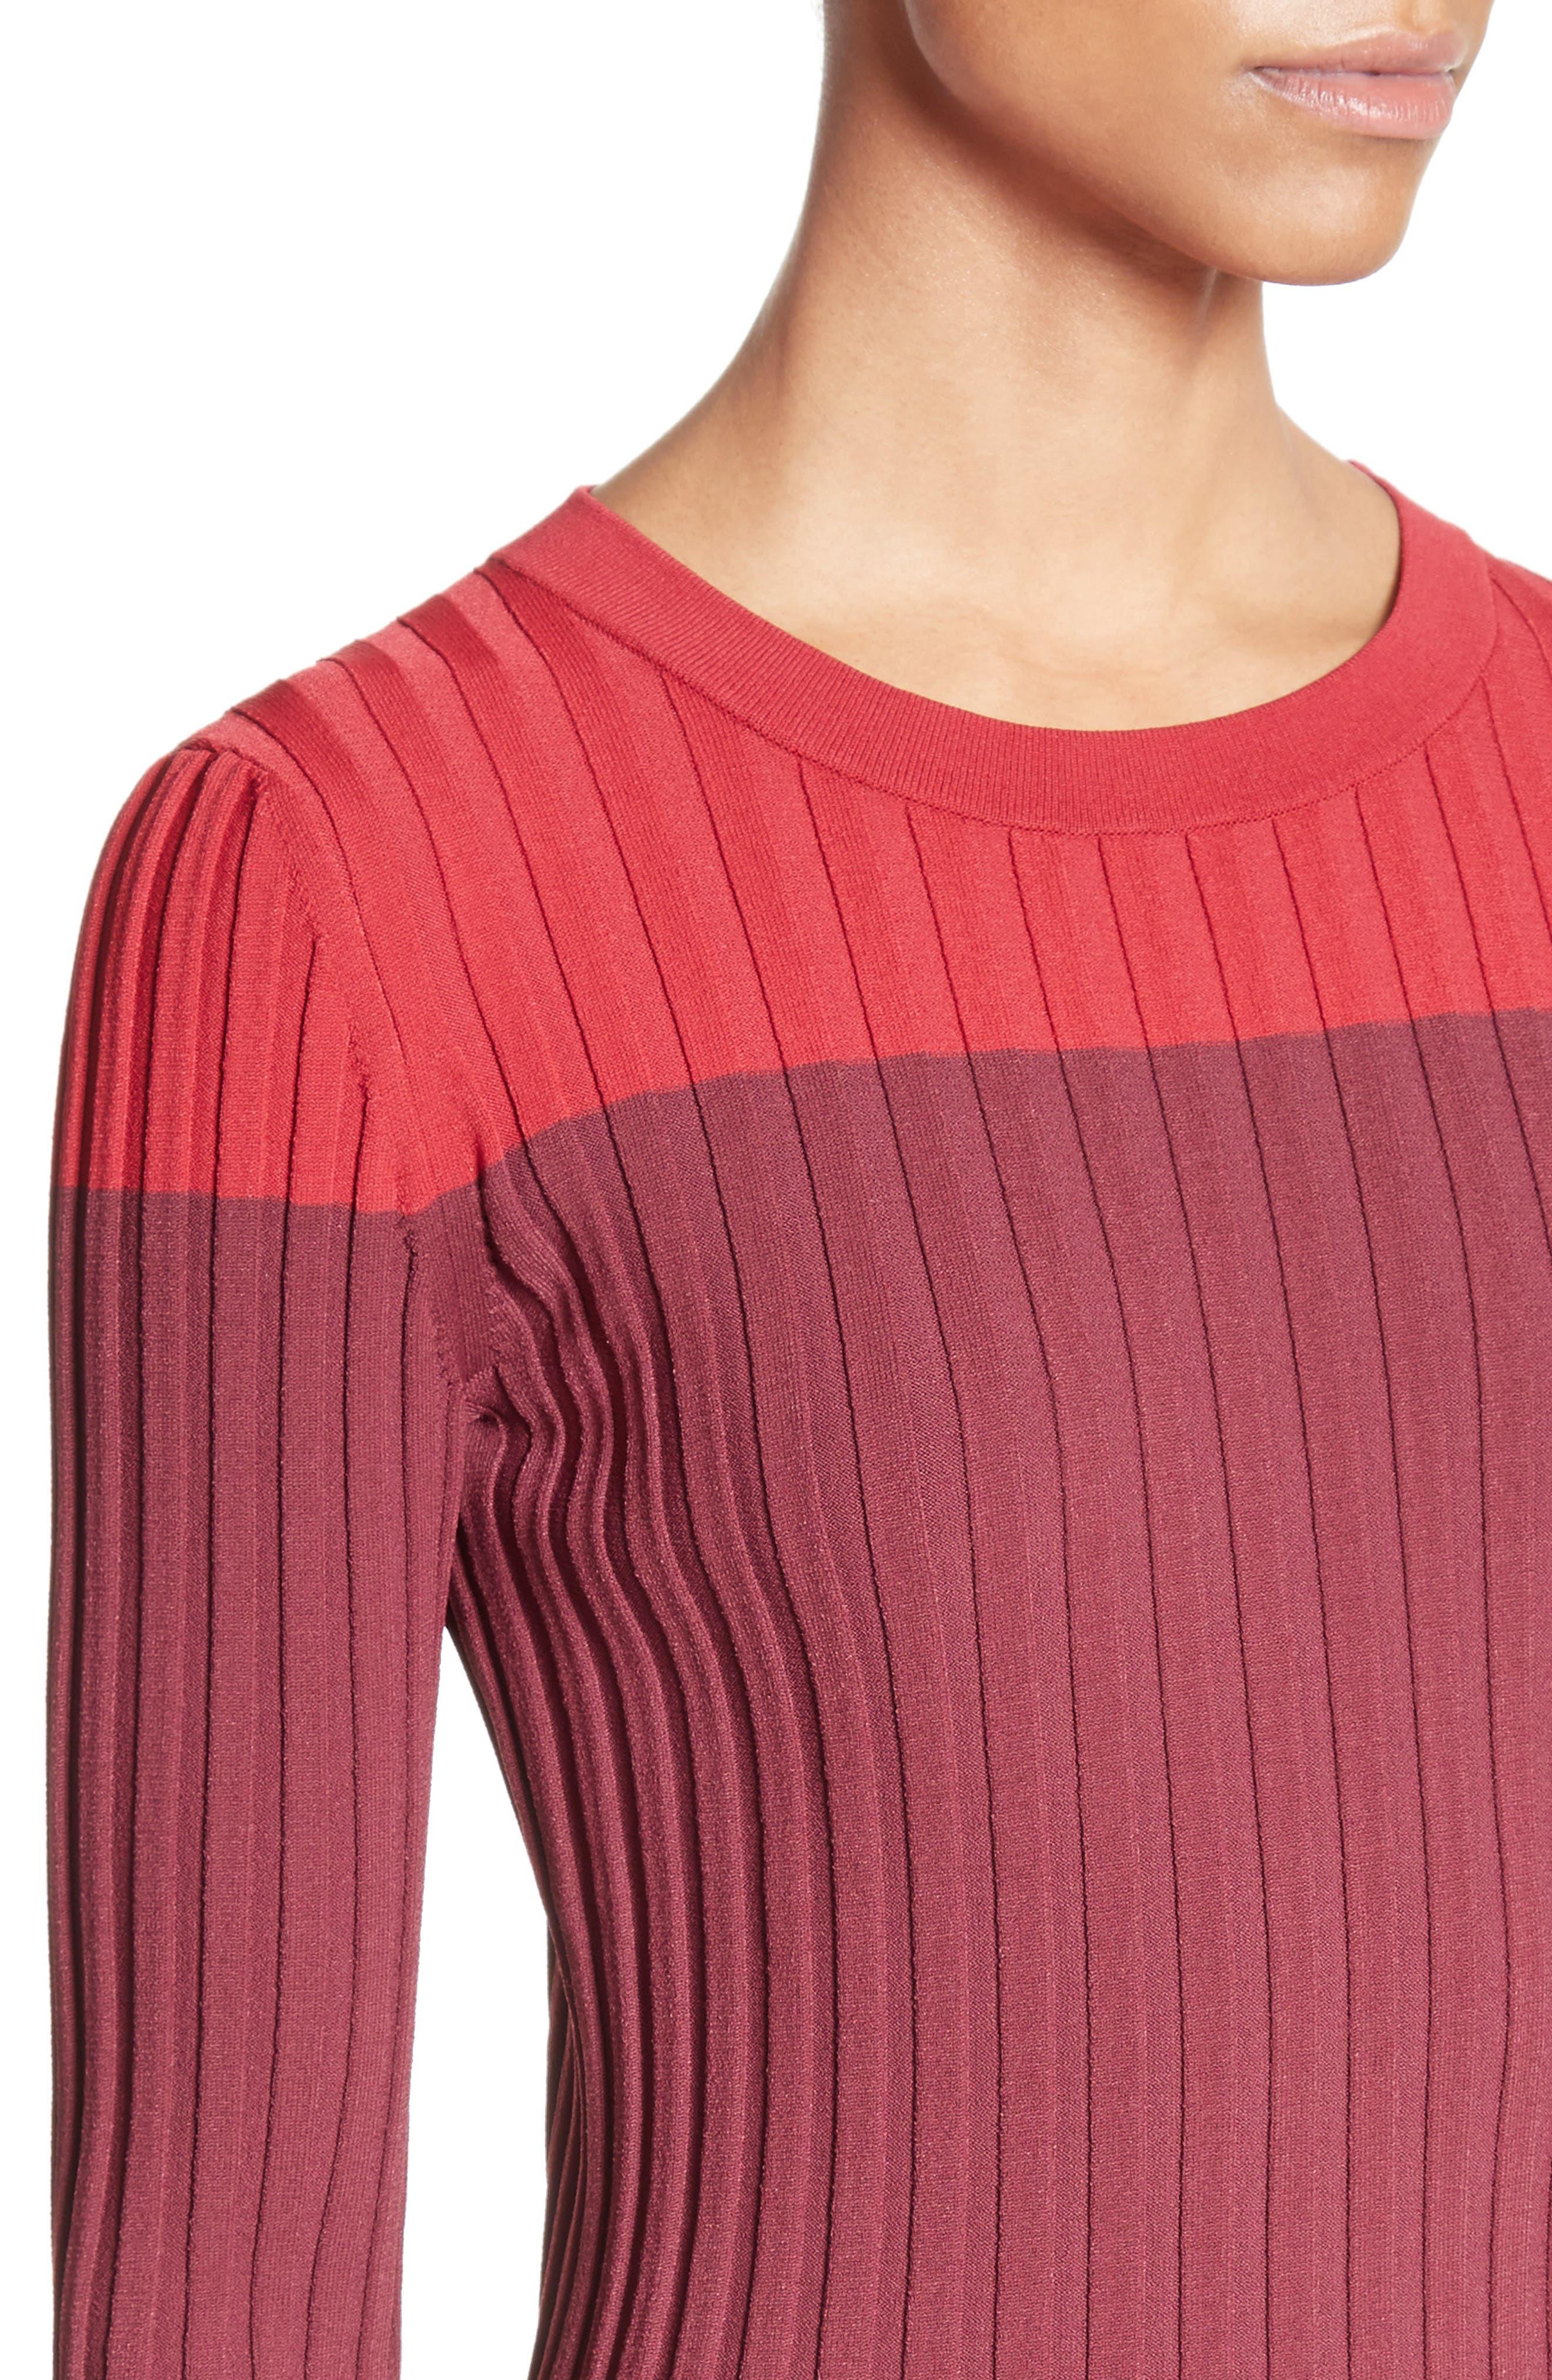 Leila Colorblock Knit Sweater,                             Alternate thumbnail 4, color,                             504